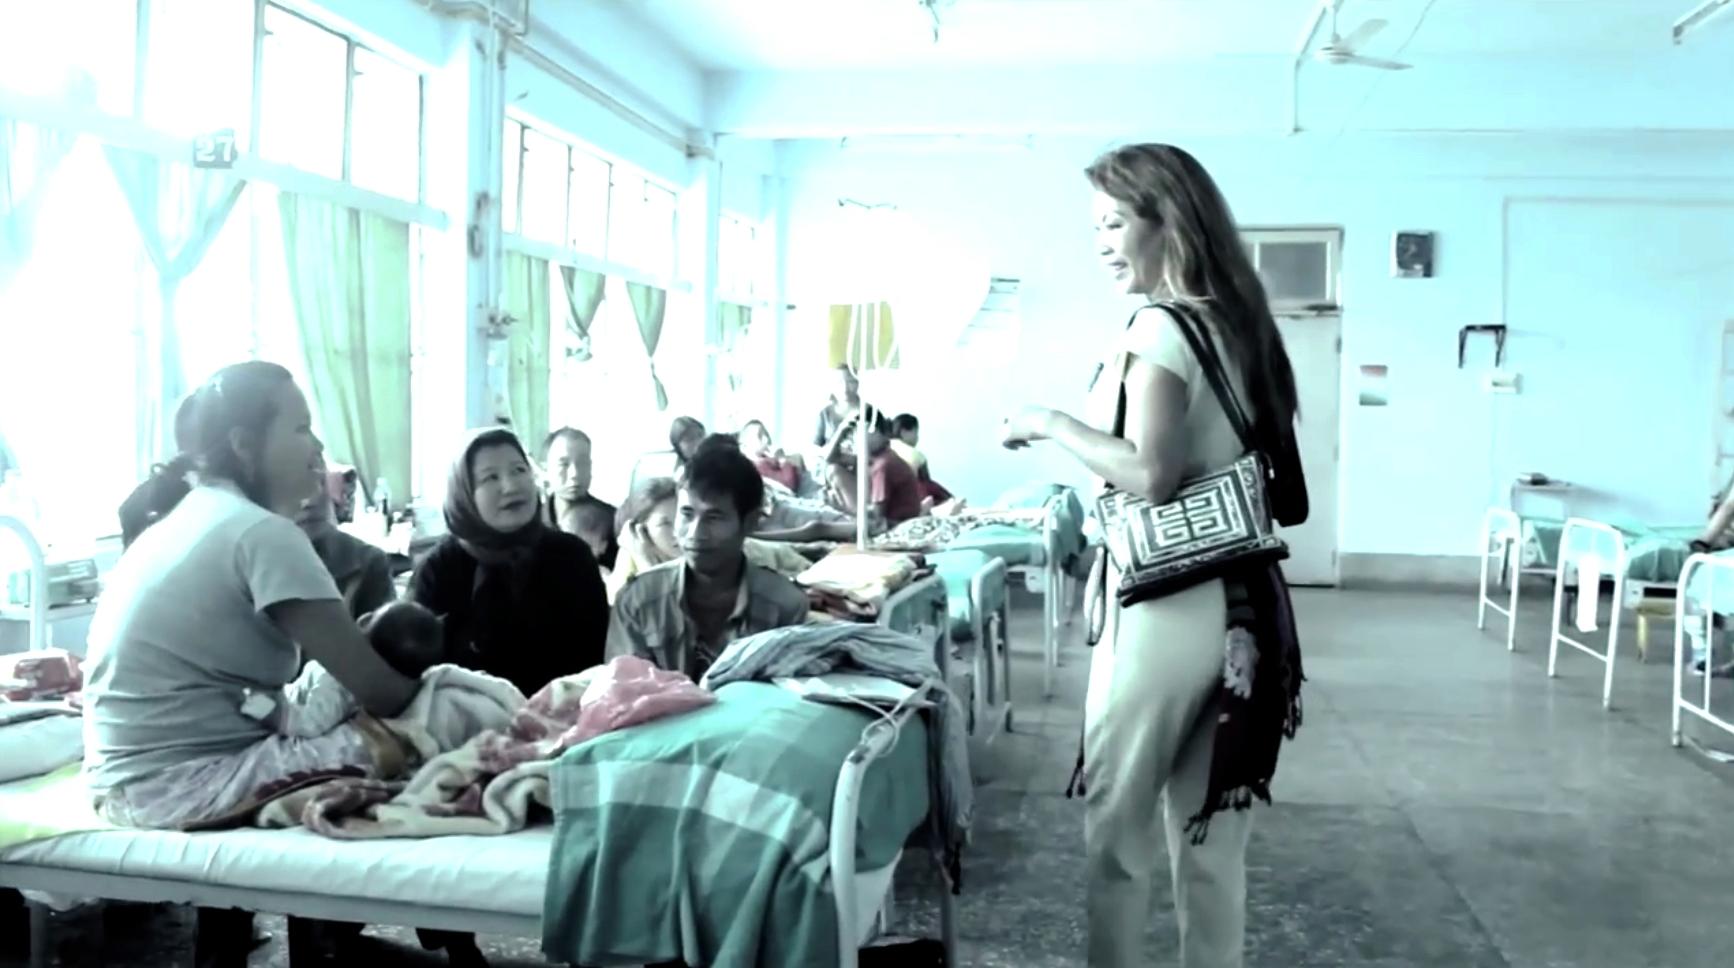 Hilfe im Krankenhaus